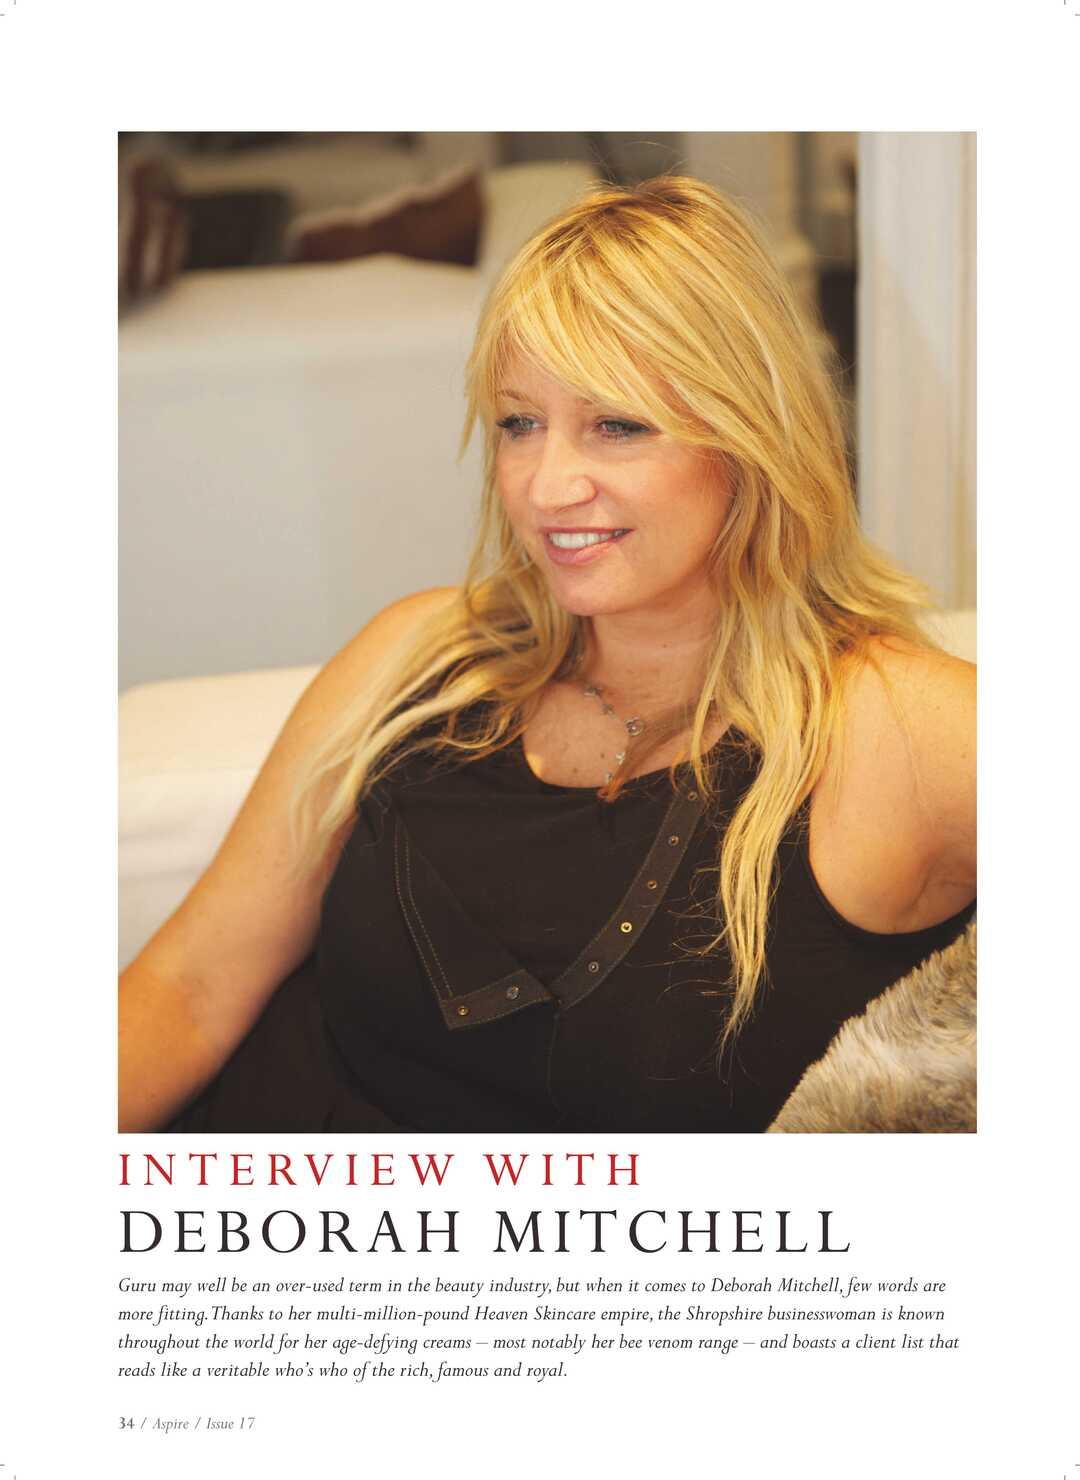 Page 34 of Deborah Mitchell